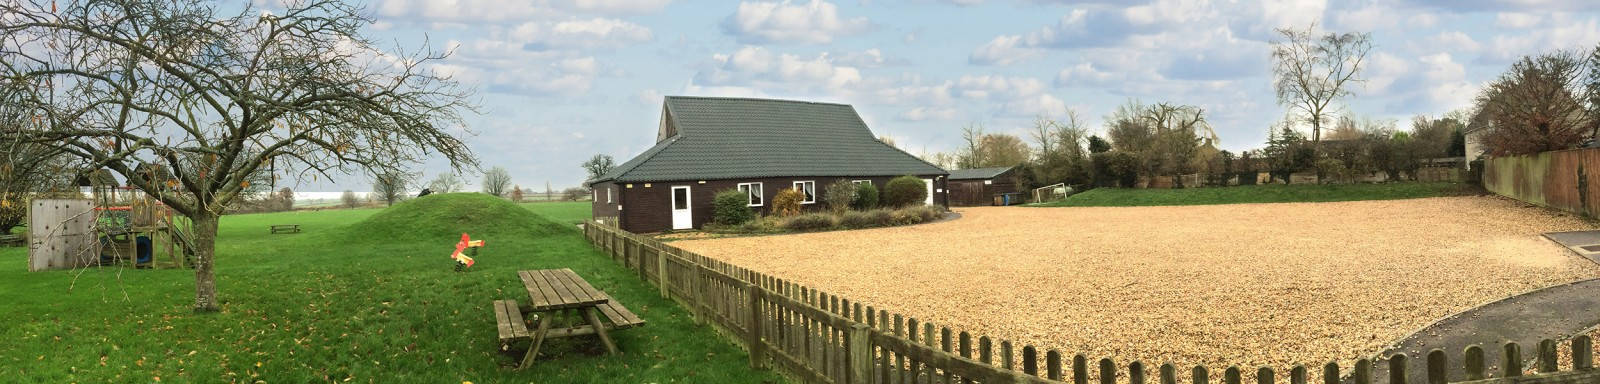 Charlton Village Hall & Recreation Grounds